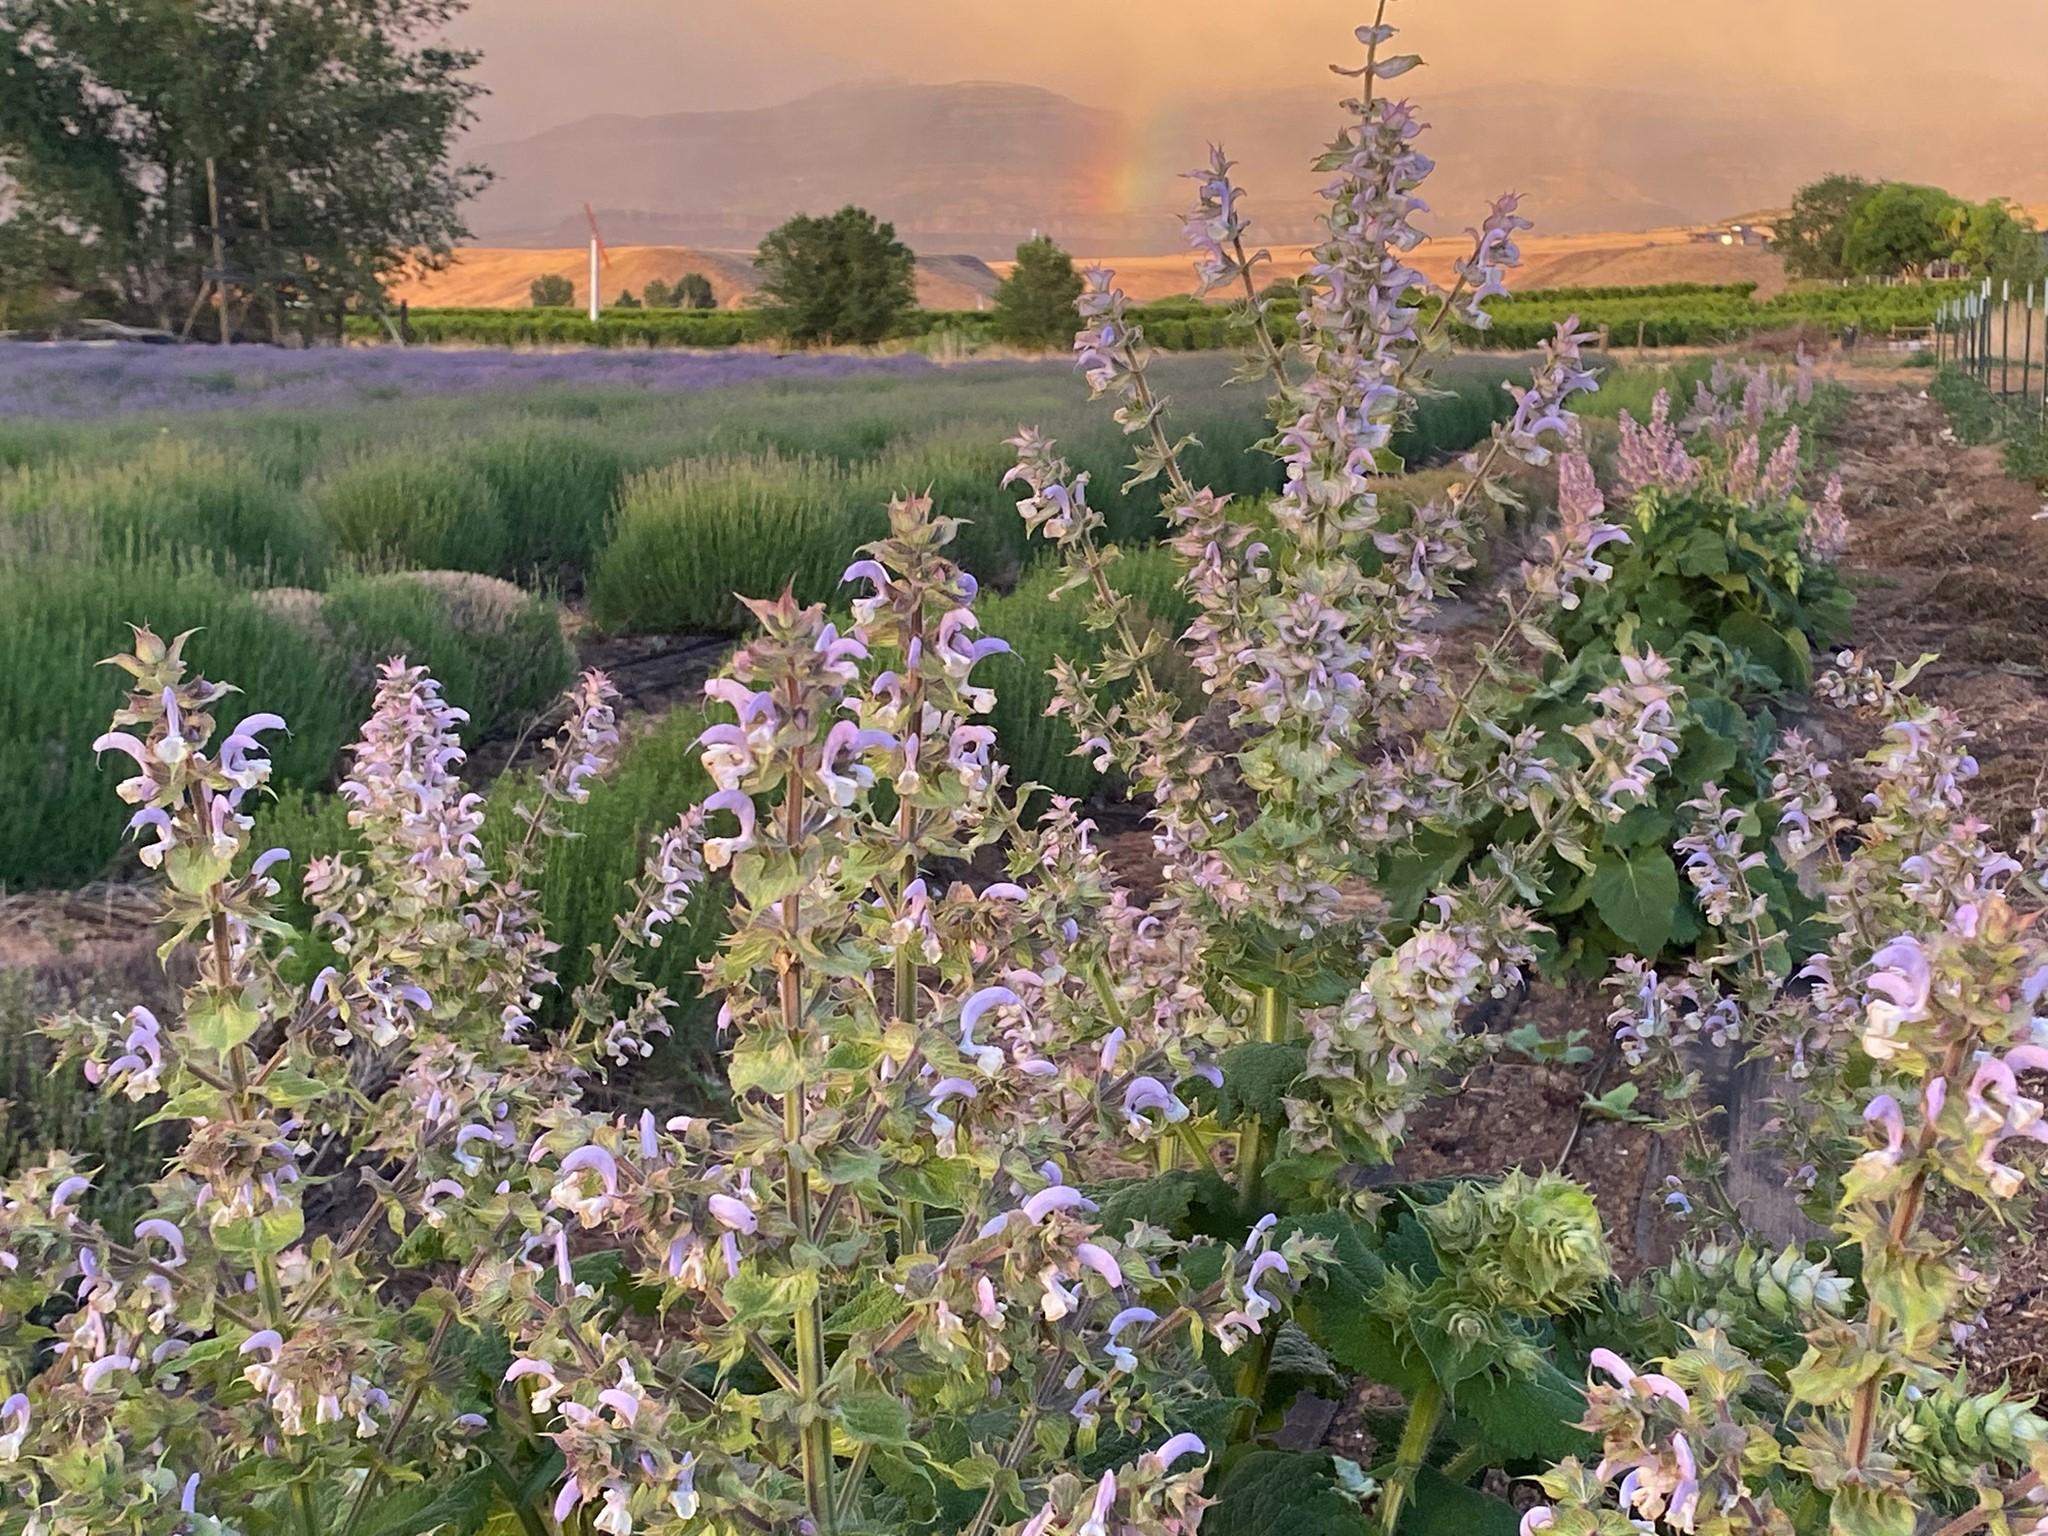 image of sage creations organic farm